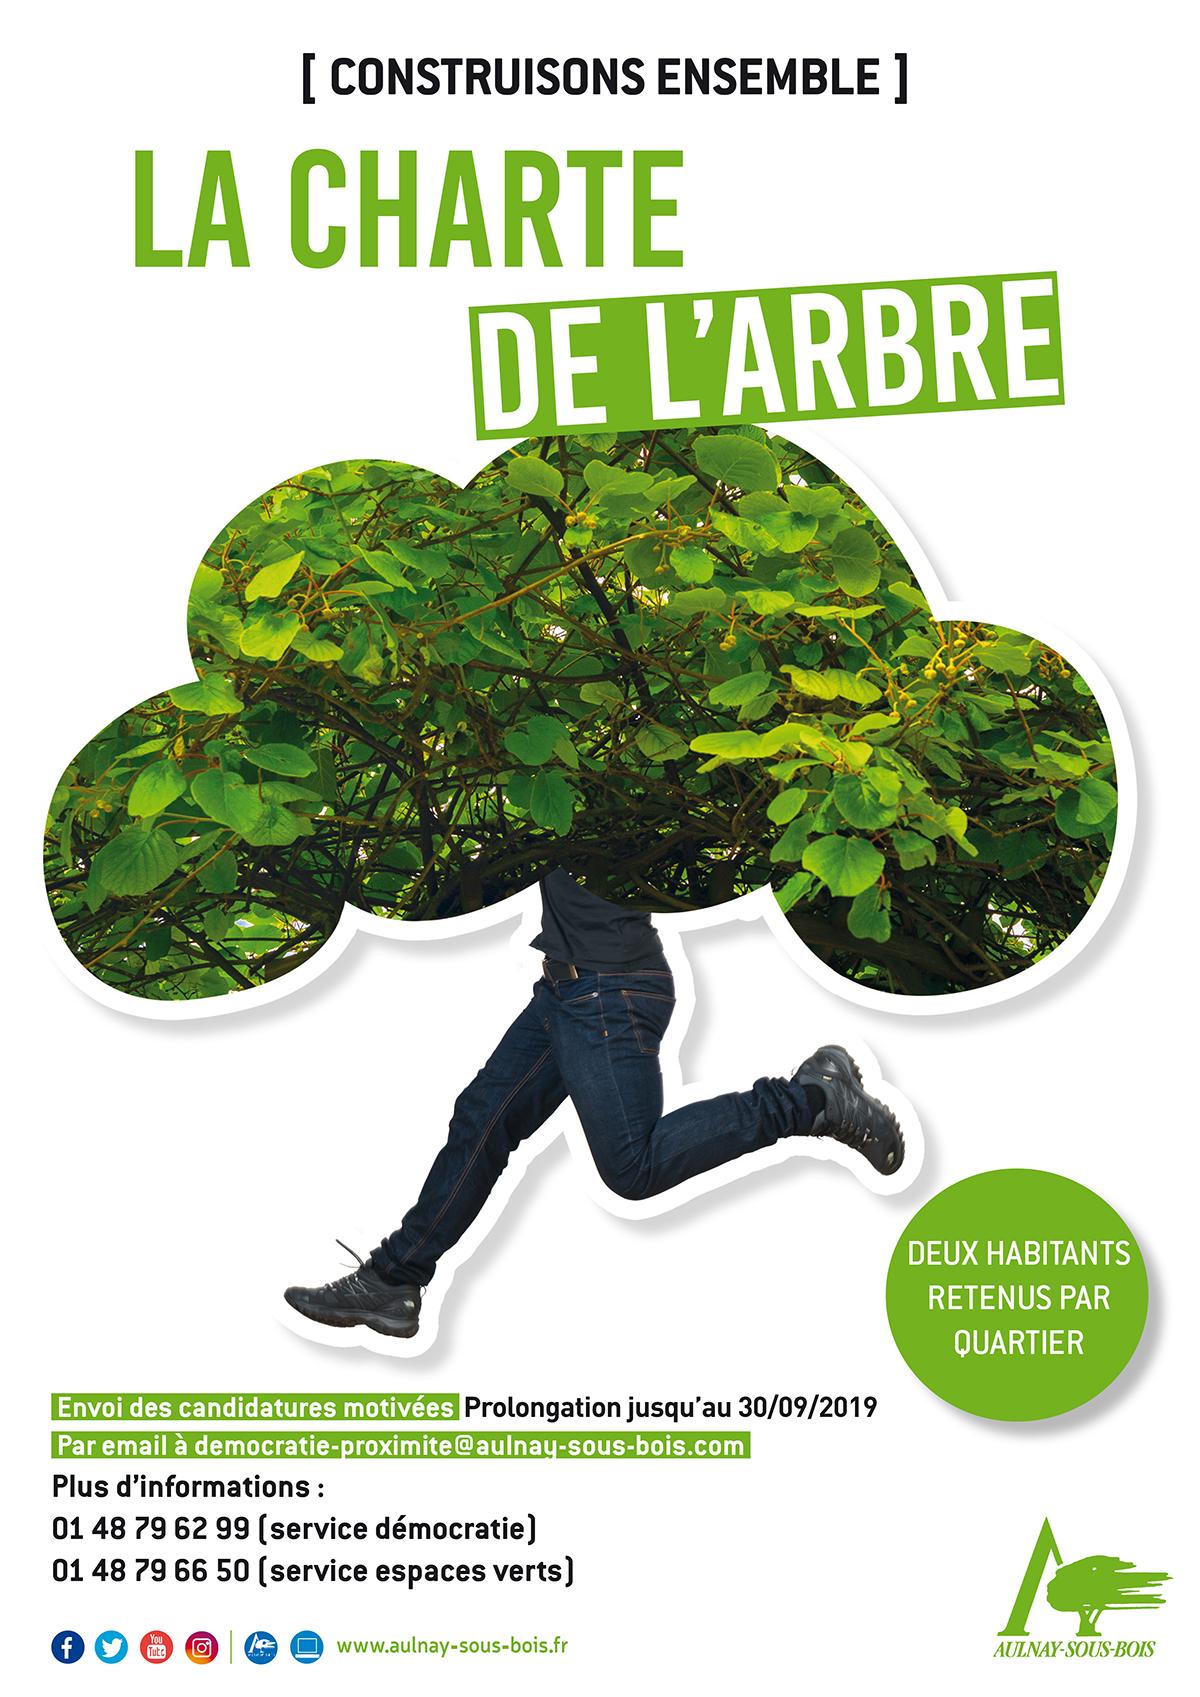 Charte de l'arbre /30septembre 2019